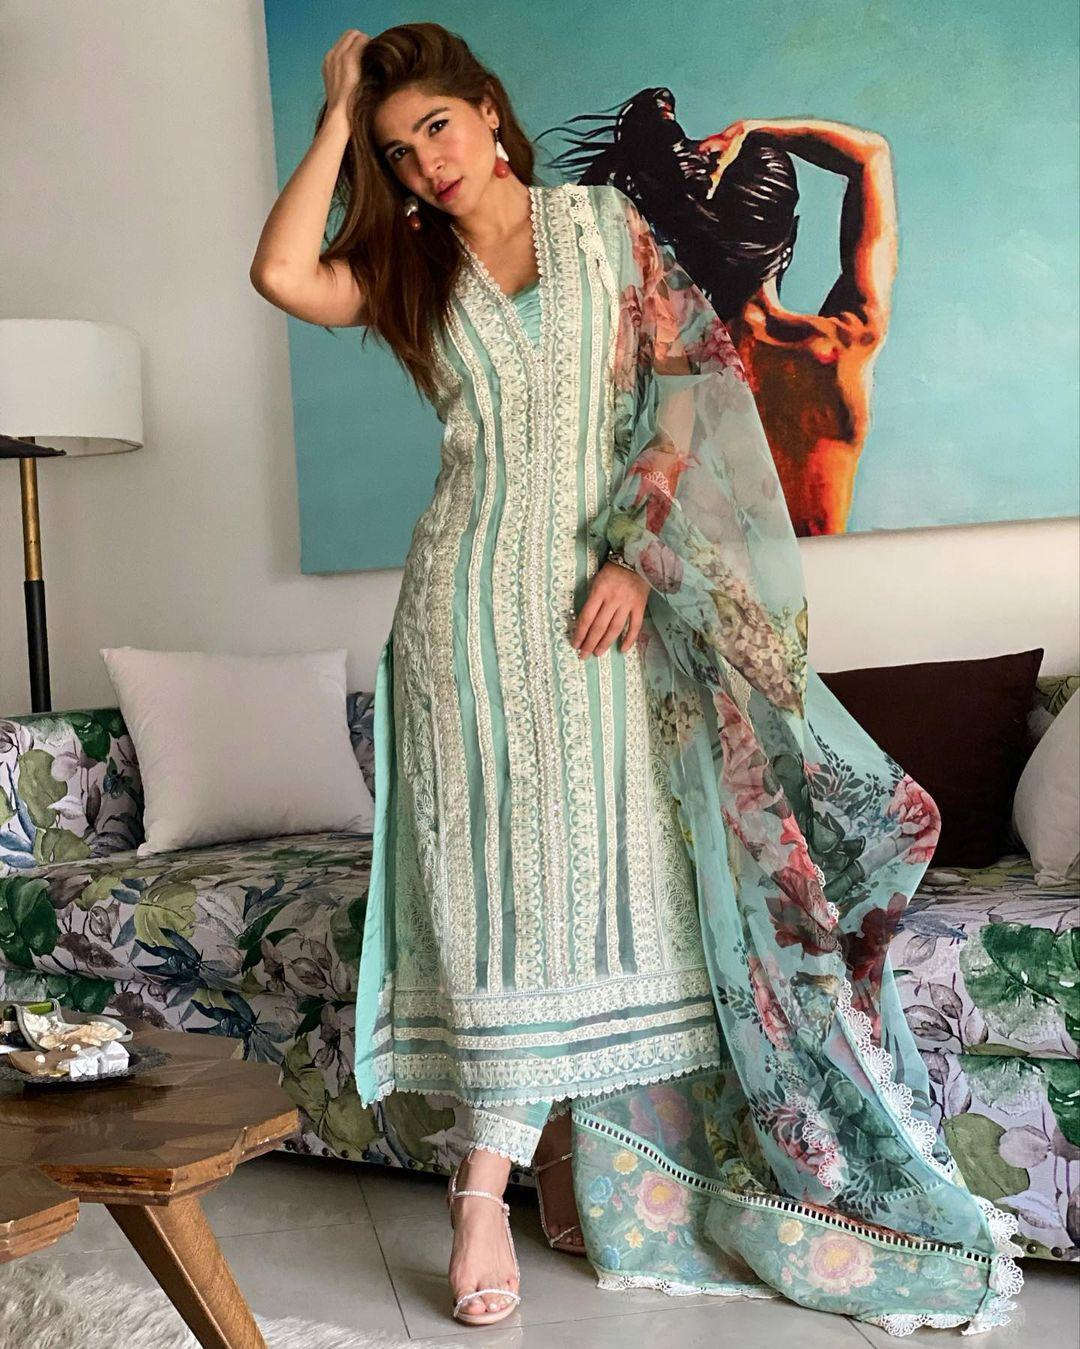 Beautiful Pictures Of Pakistani Celebrities Celebrating Eid-ul-Fitr 2021 - Day 3